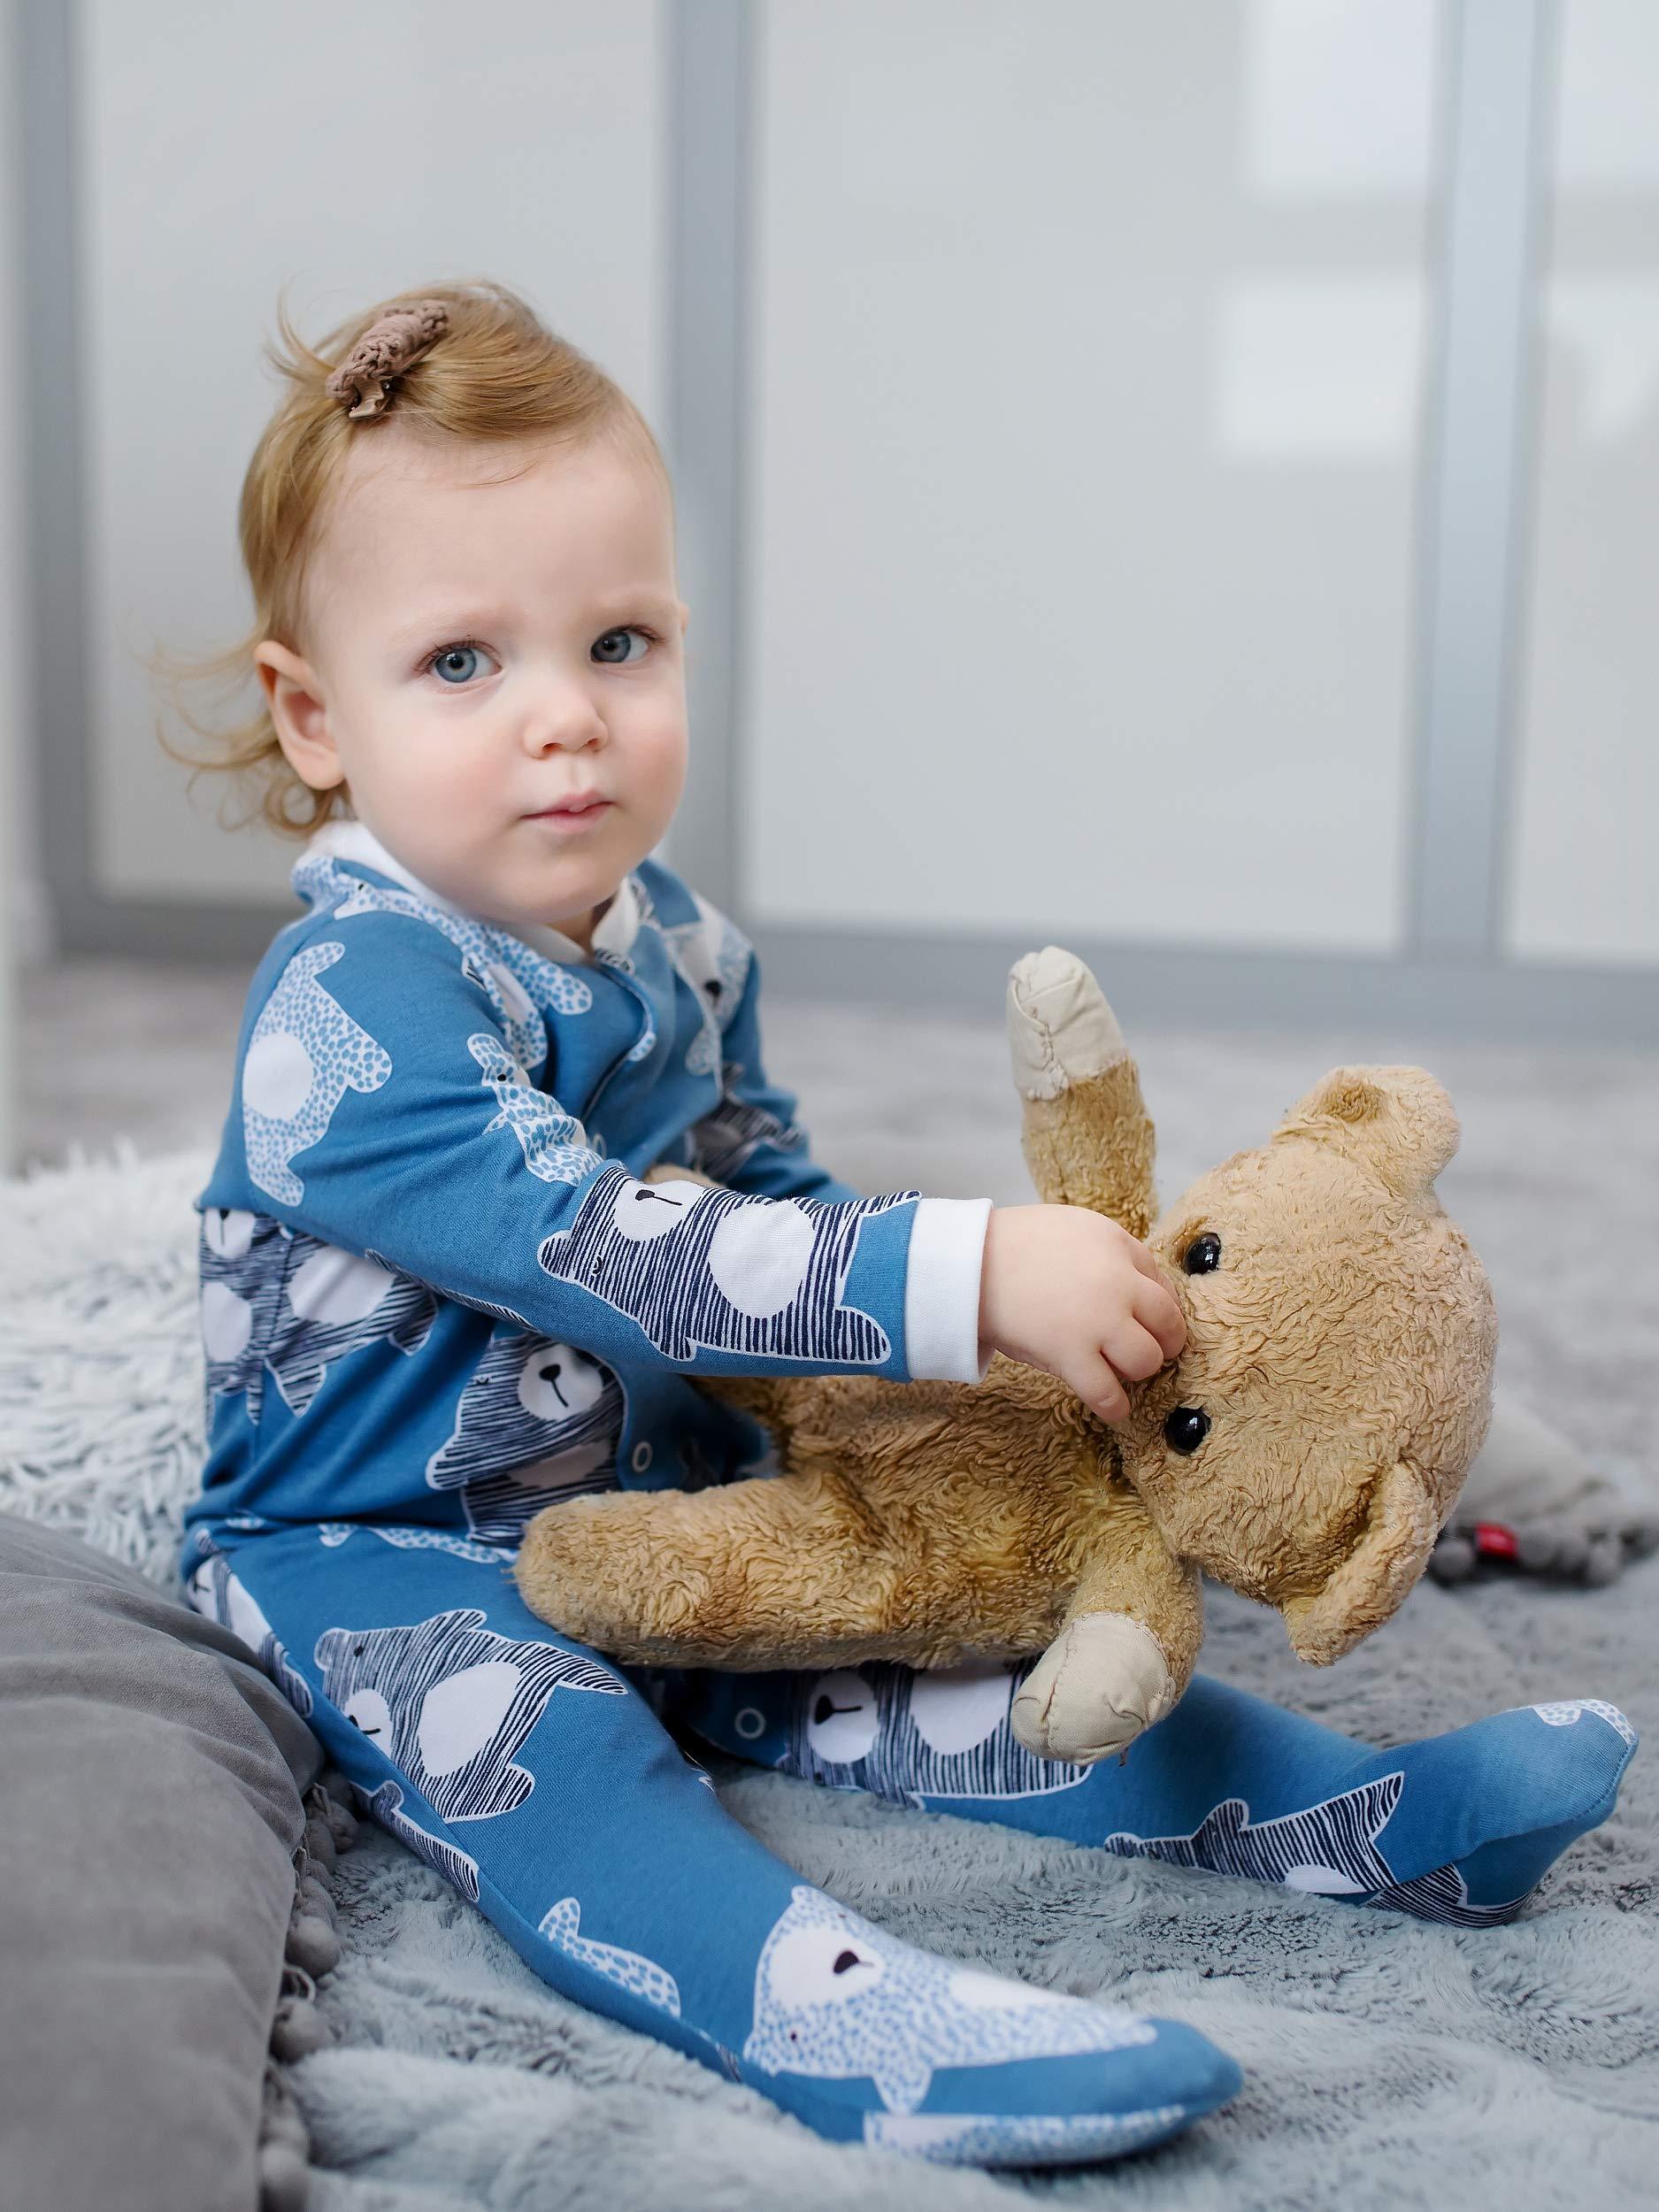 Sibinulo Niño Niña Pijama Bebé Pelele de Algodón- Tamaños 56-74 - Pack de 3 9